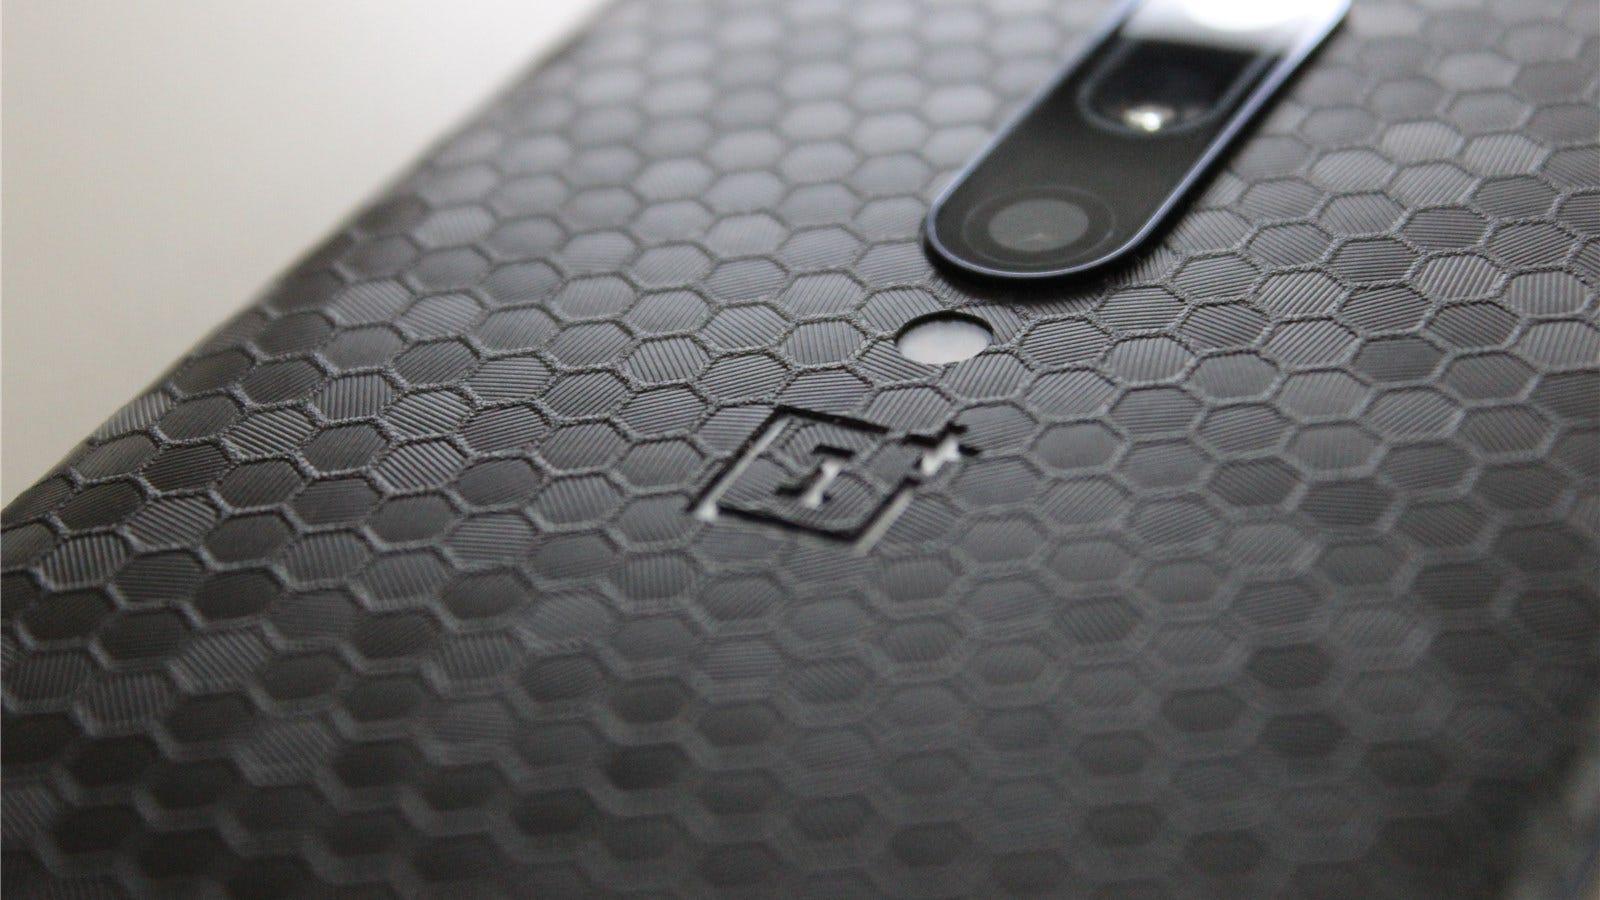 dbrand Swarm skin on the OnePlus 7 Pro